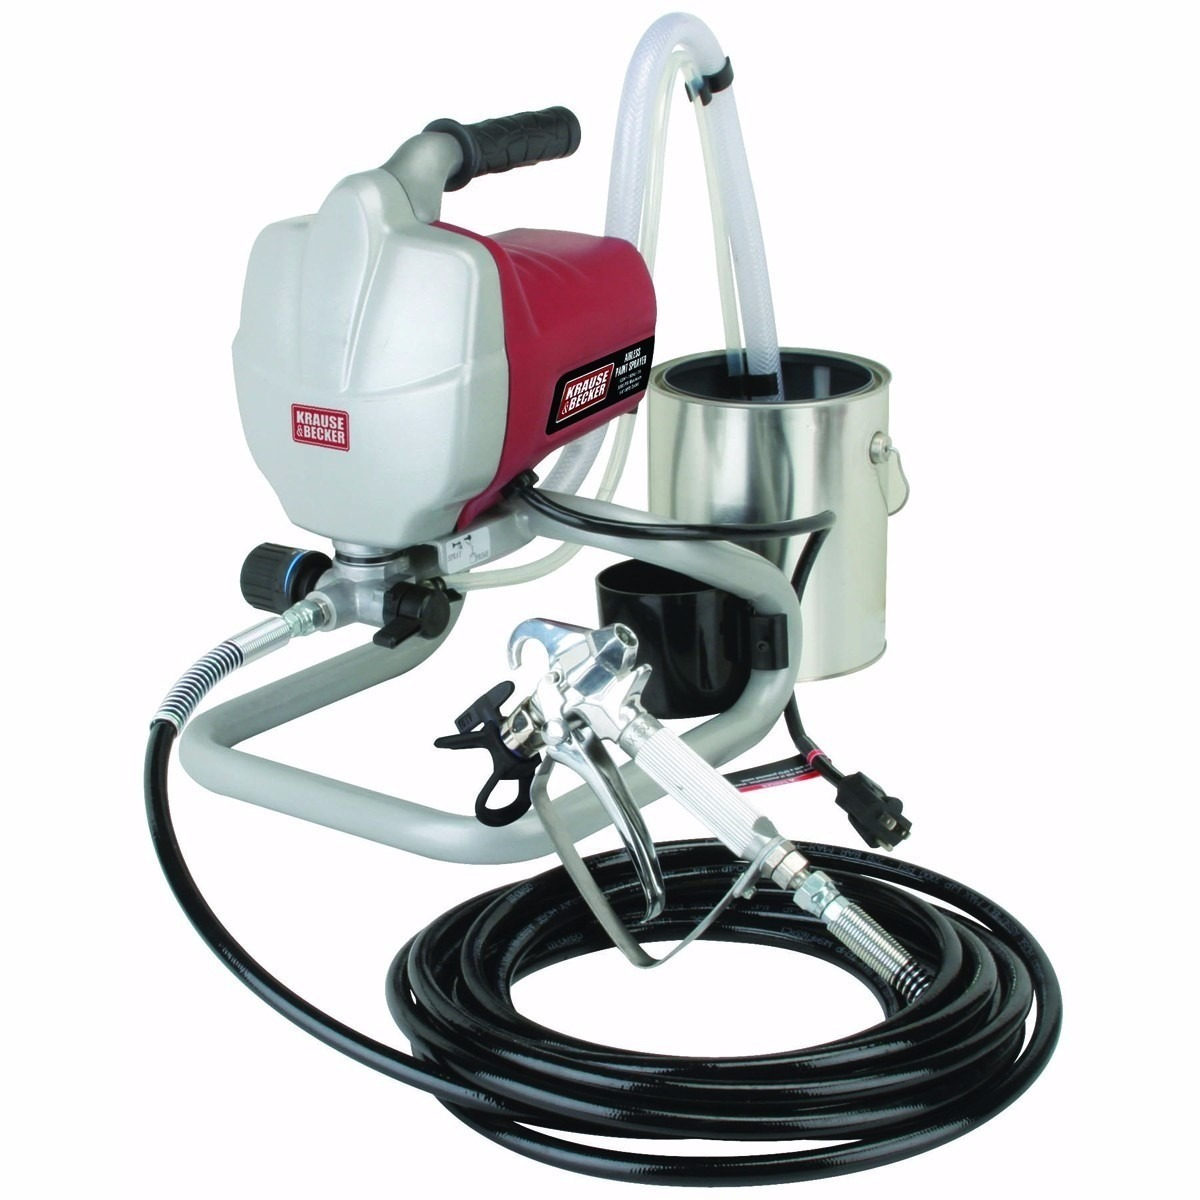 Equipo Maquina Pintar Airless Paint Sprayer Kit 5 8hp